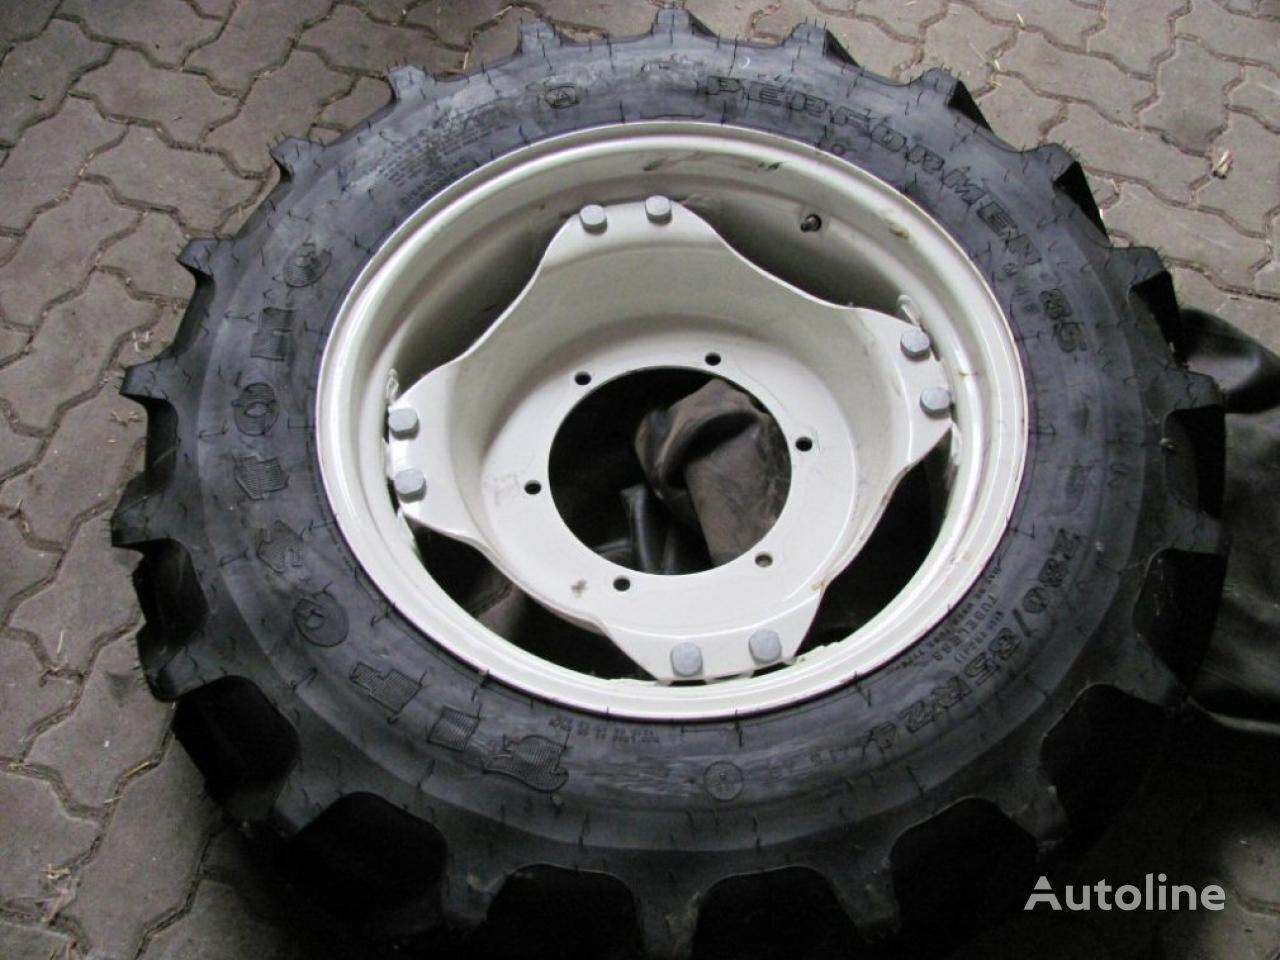 Firestone Radsatz rueda nuevo